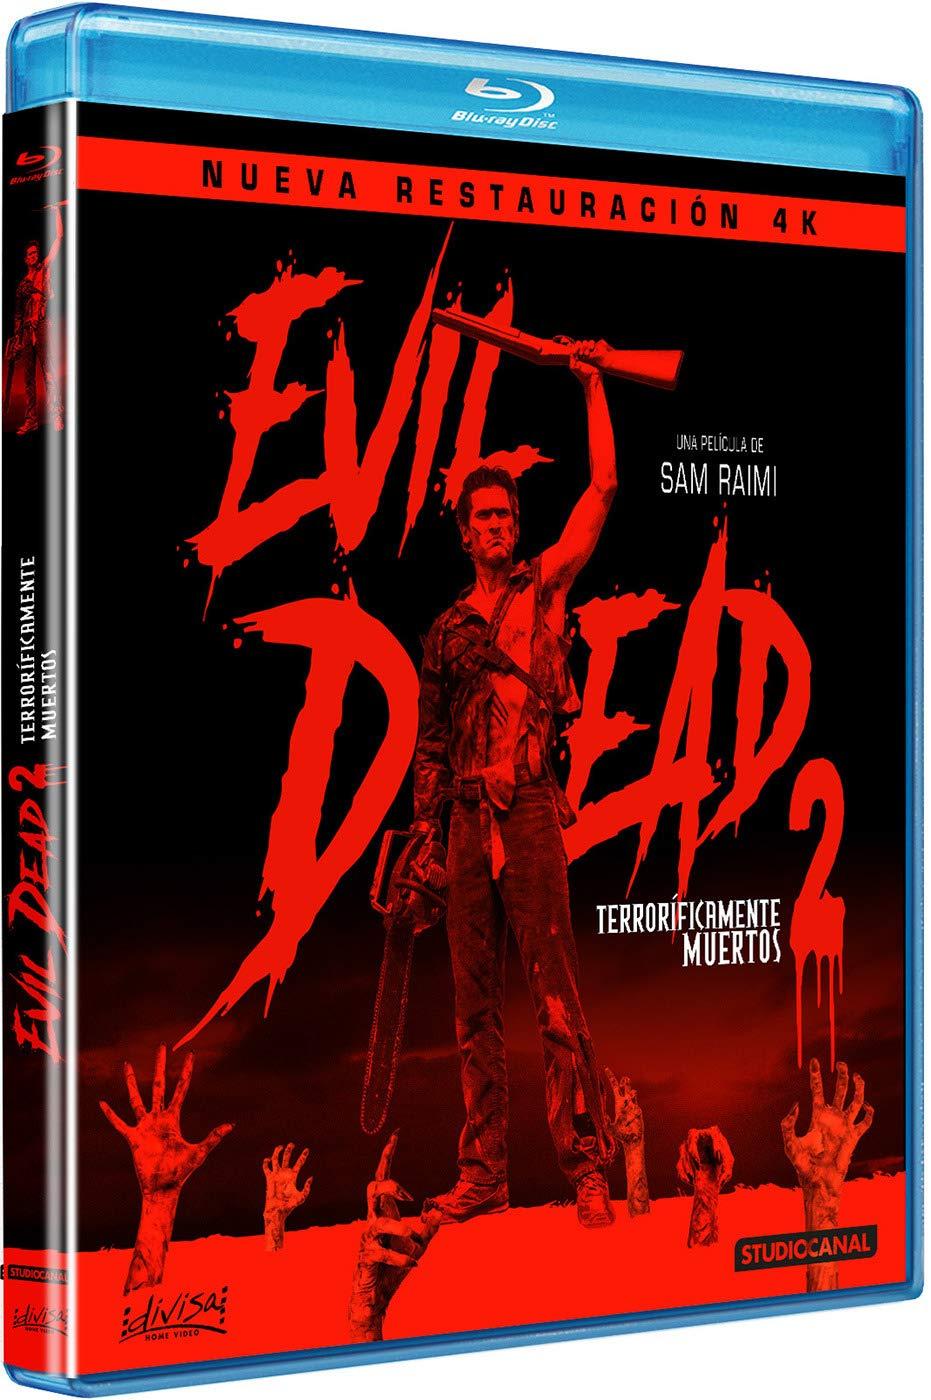 Evil dead 2 (terroríficamente muertos) - BD [Blu-ray]: Amazon.es: Bruce Campbell, Sarah Berry, Dan Hicks, Kassie Wesley DePaiva, Sam Raimi, Bruce Campbell, Sarah Berry: Cine y Series TV